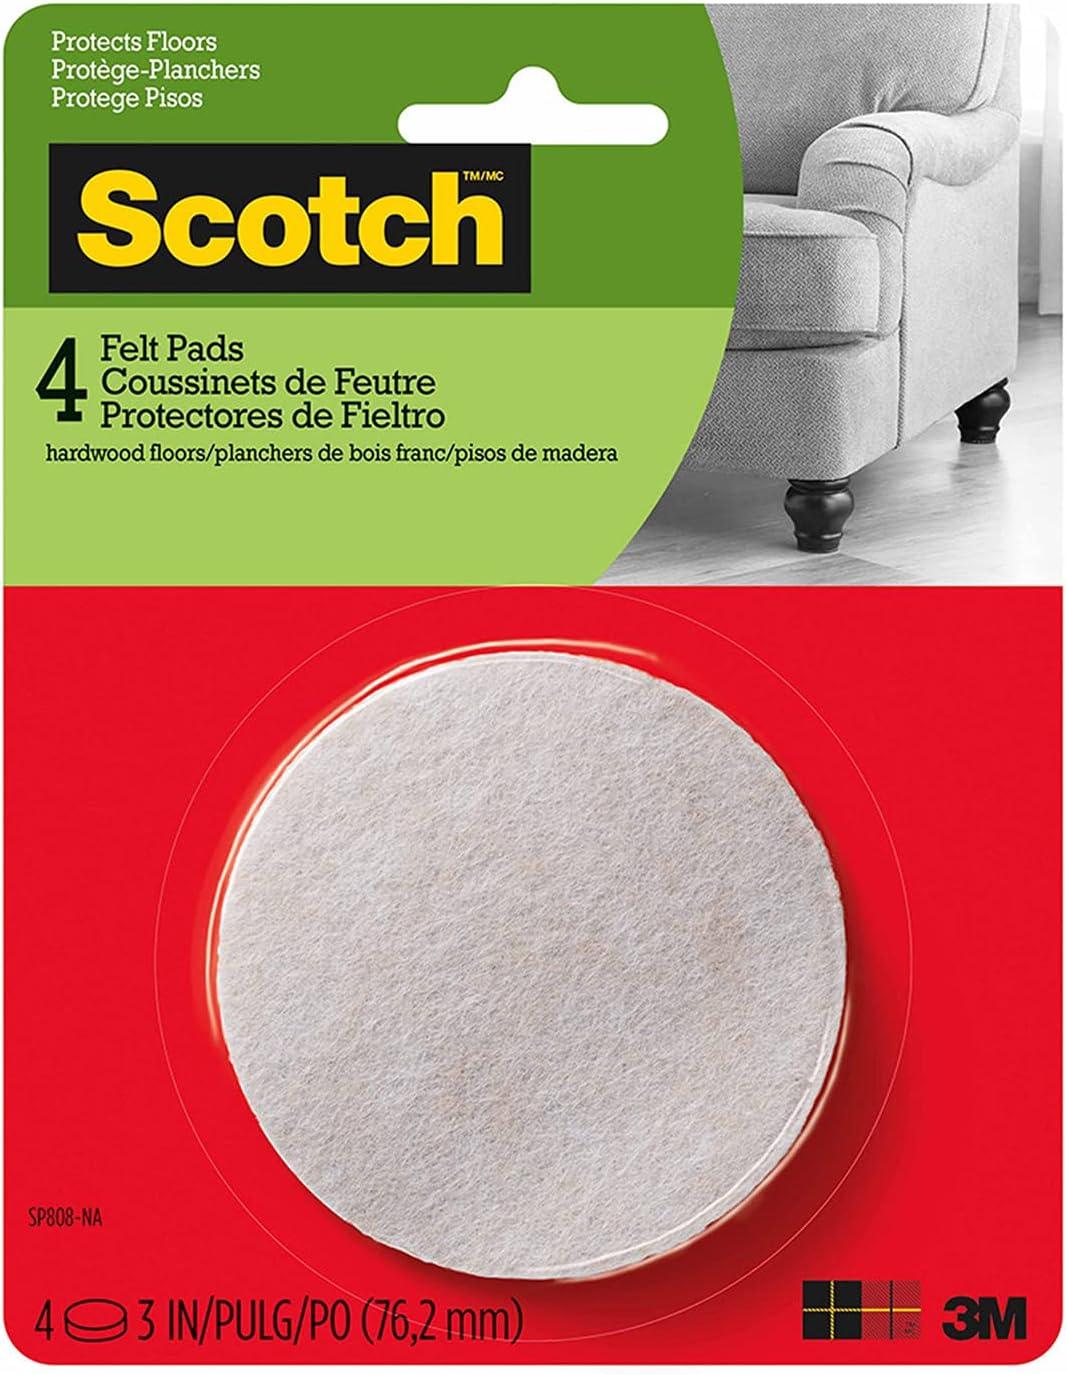 Scotch Felt Pads Credence Furniture Hardwood for Protecting Fl wholesale